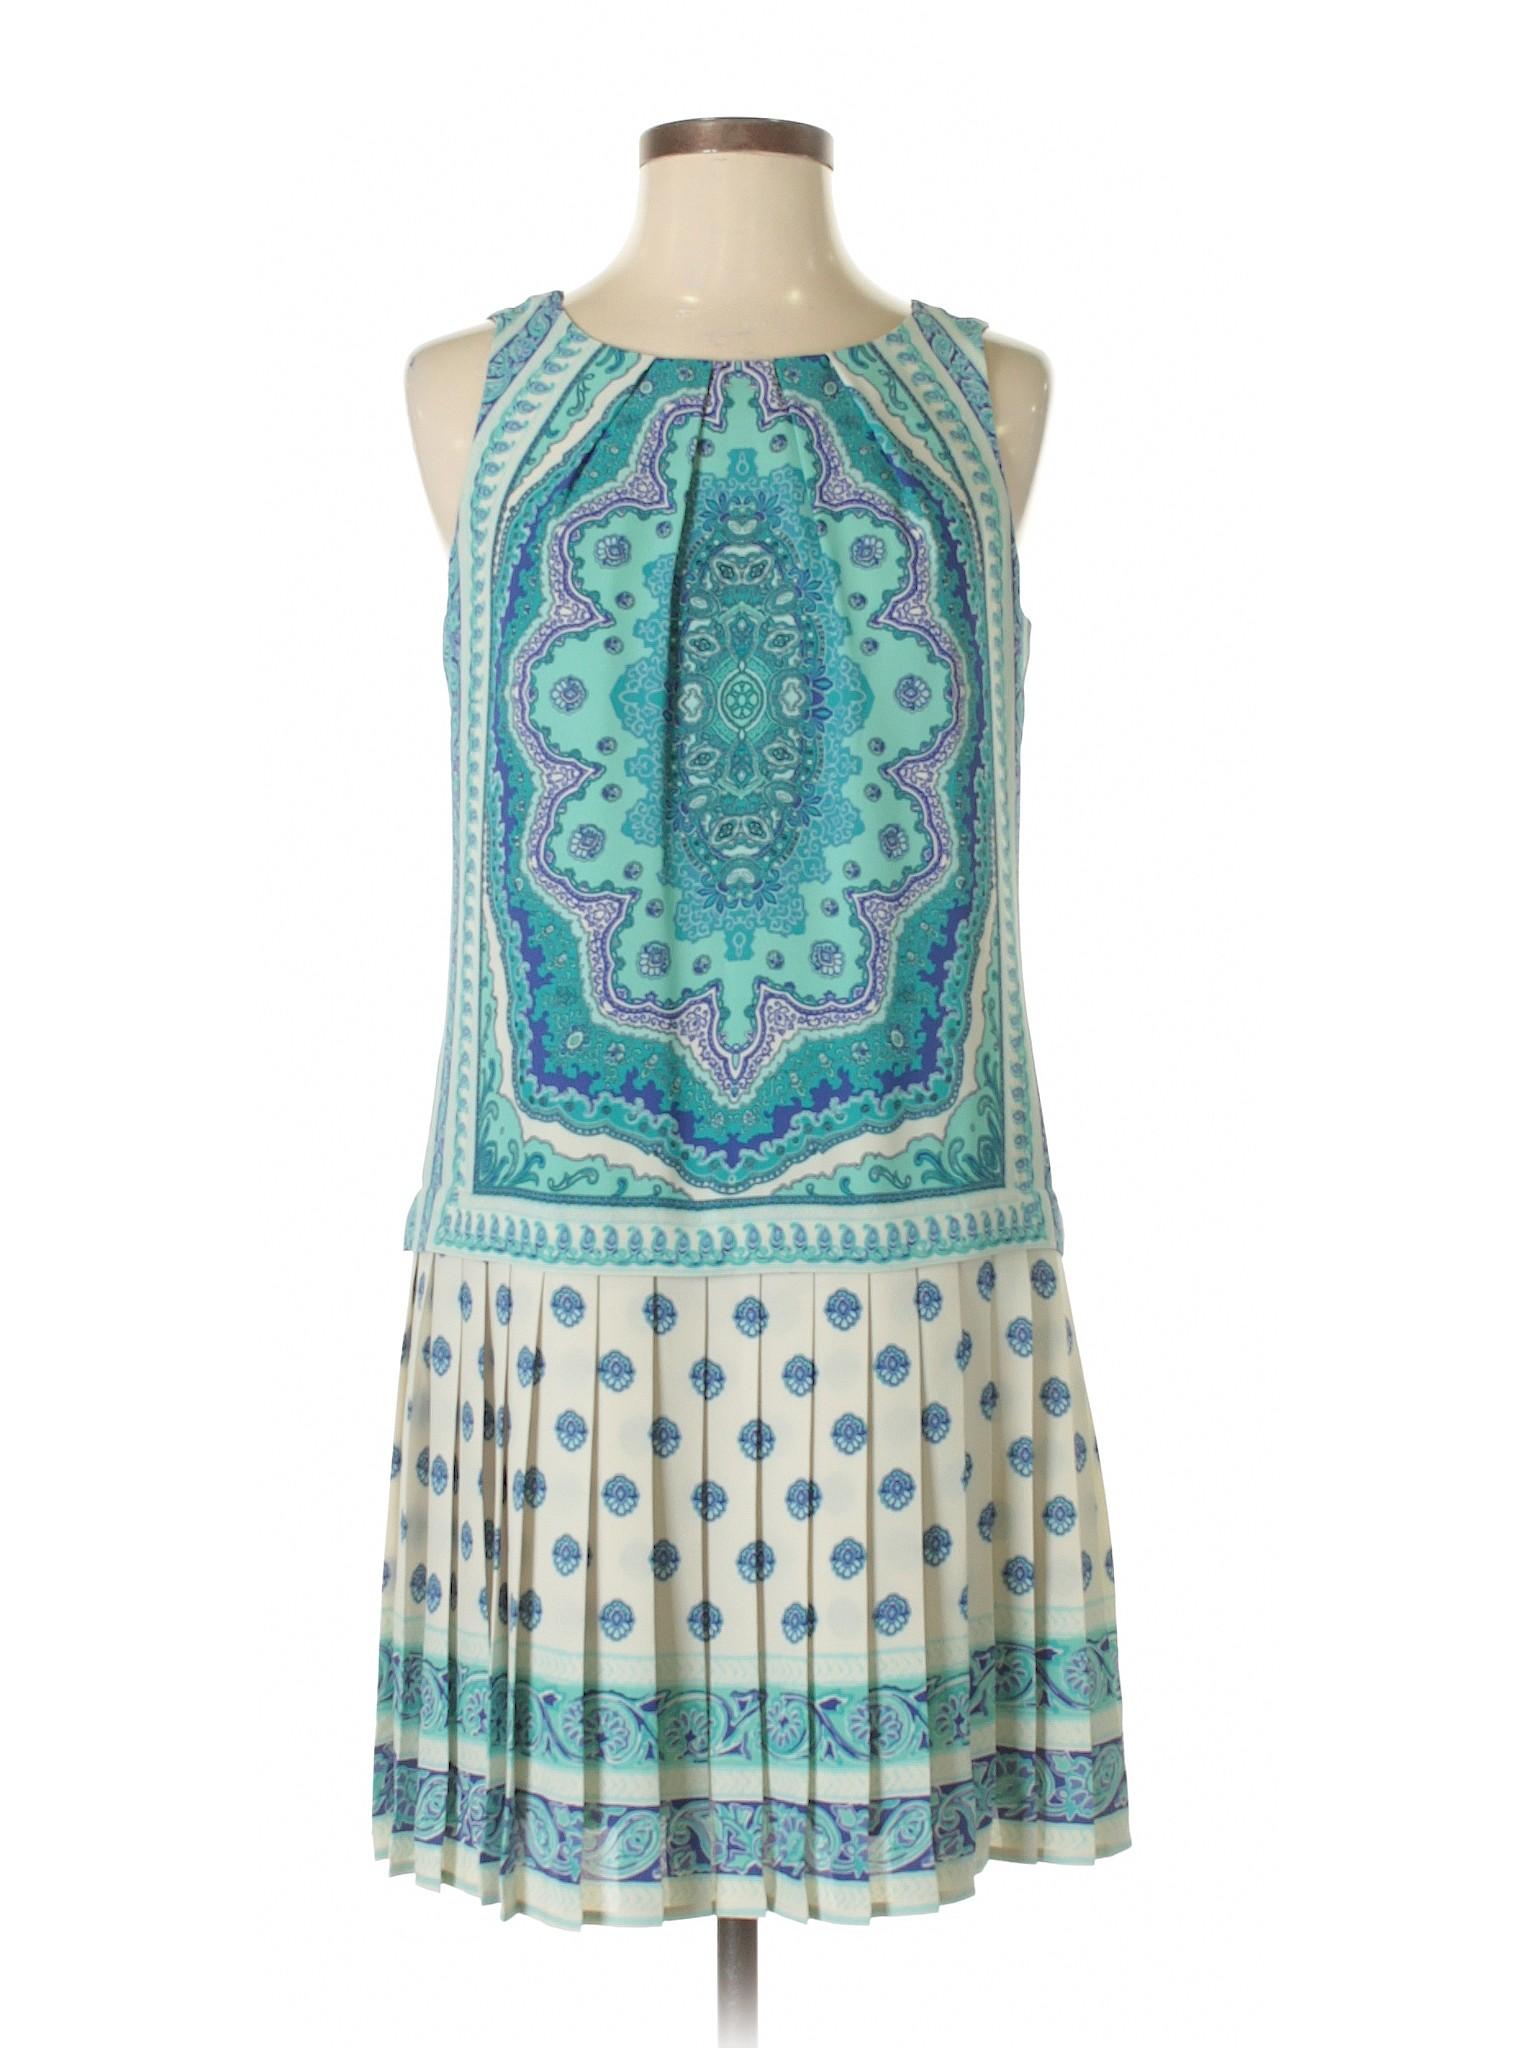 Boutique Casual Taylor winter Ann Dress LOFT rwPrqvC